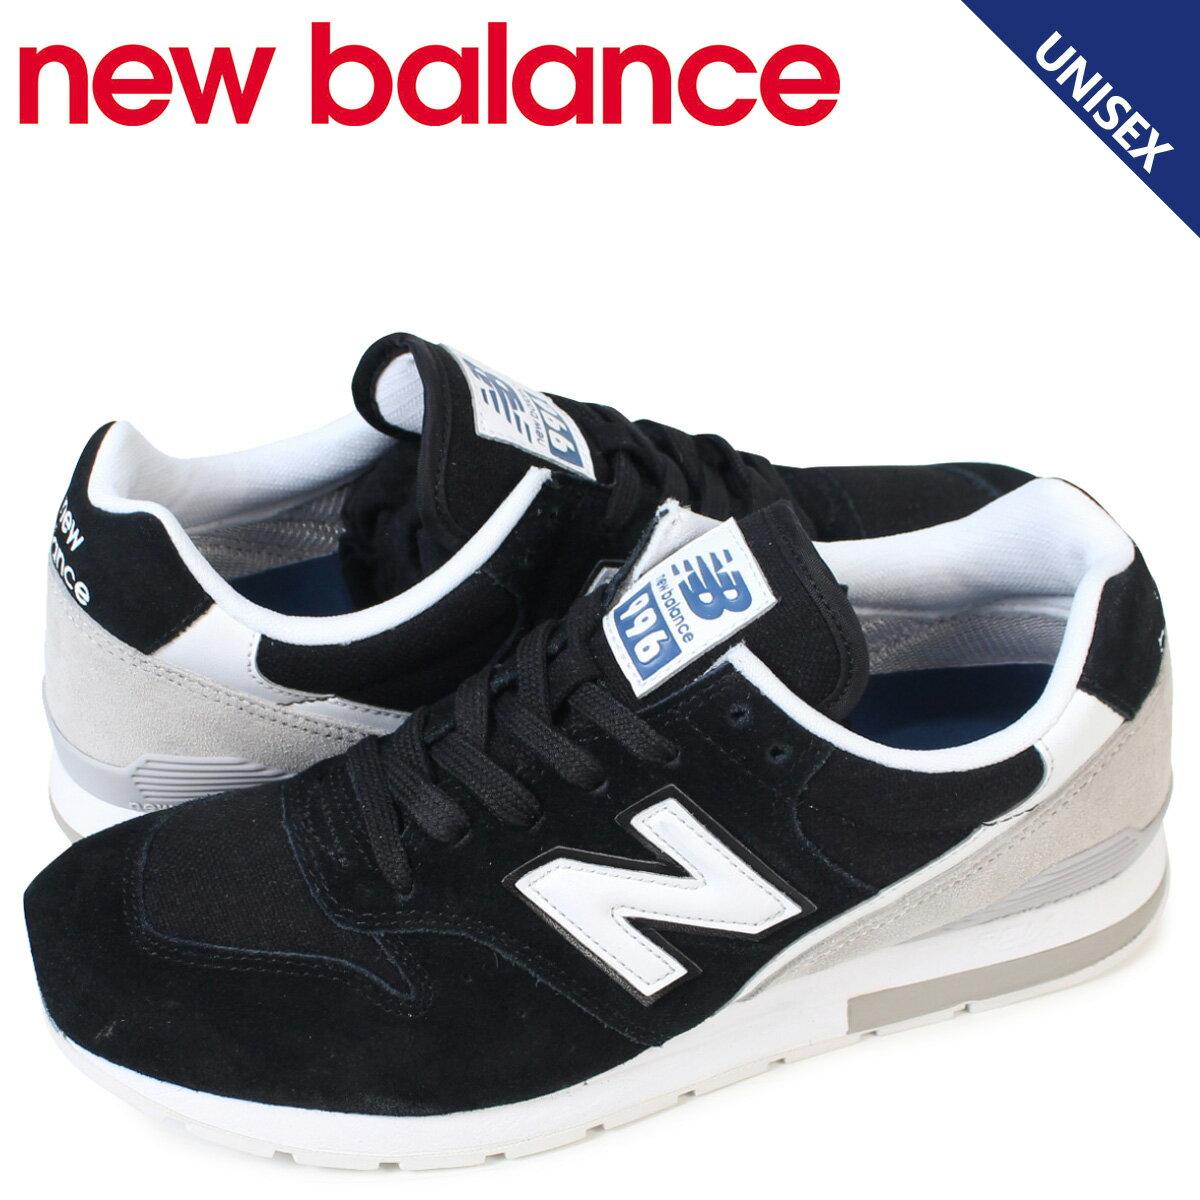 new balance 996 メンズ レディース ニューバランス スニーカー MRL996JV Dワイズ 靴 ブラック[179]